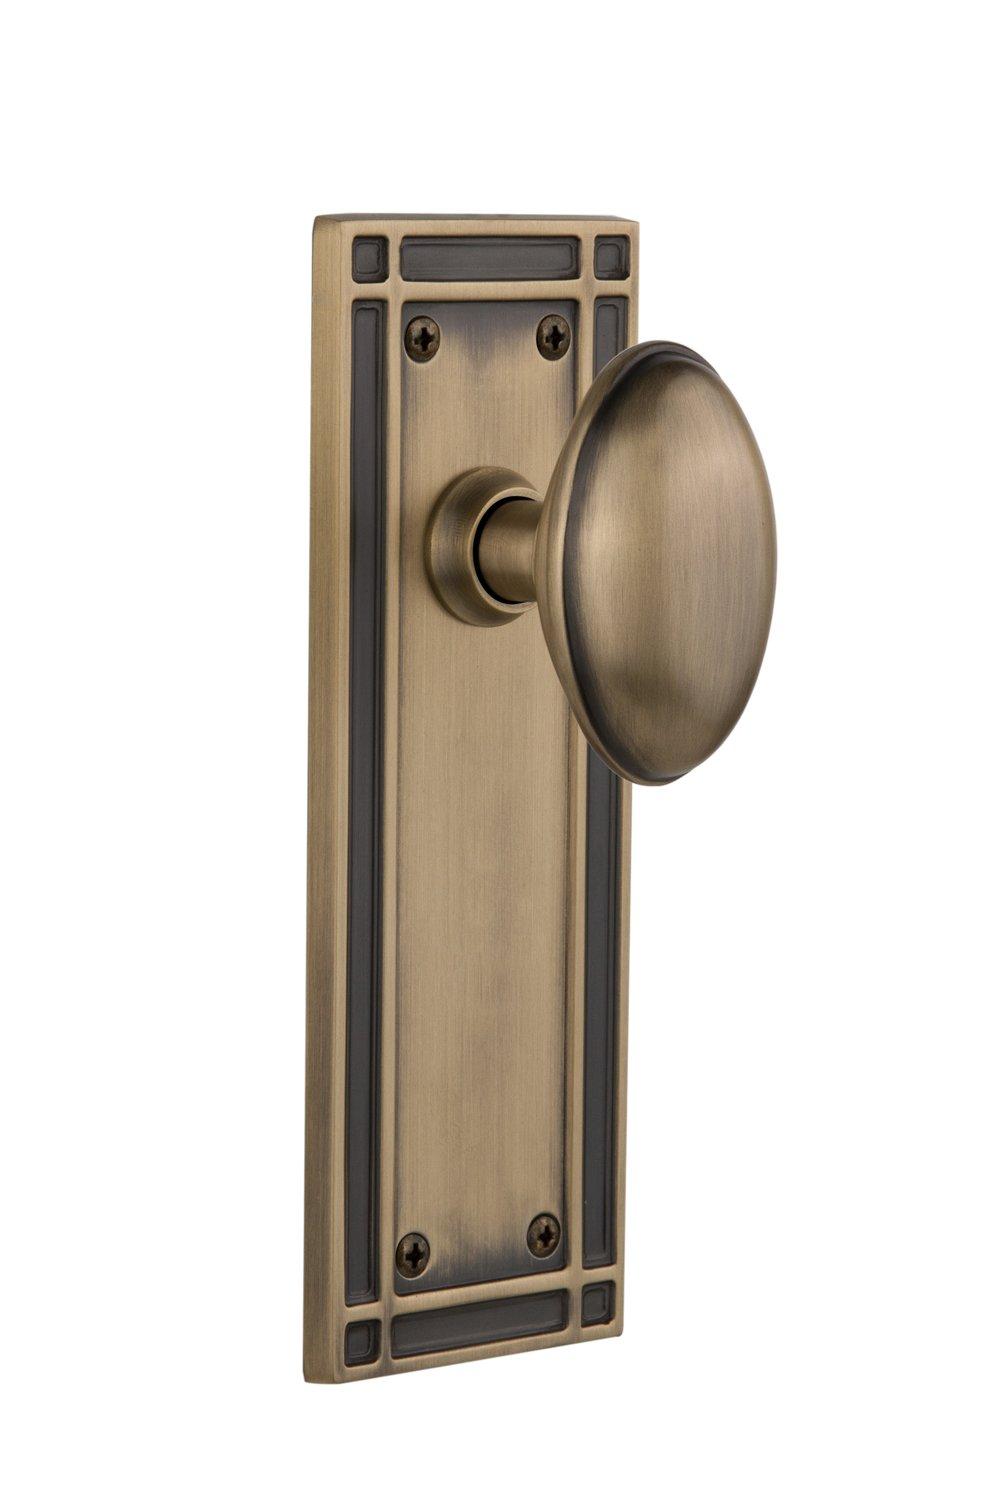 Antique Brass Single Dummy Nostalgic Warehouse Mission Plate with Homestead Knob